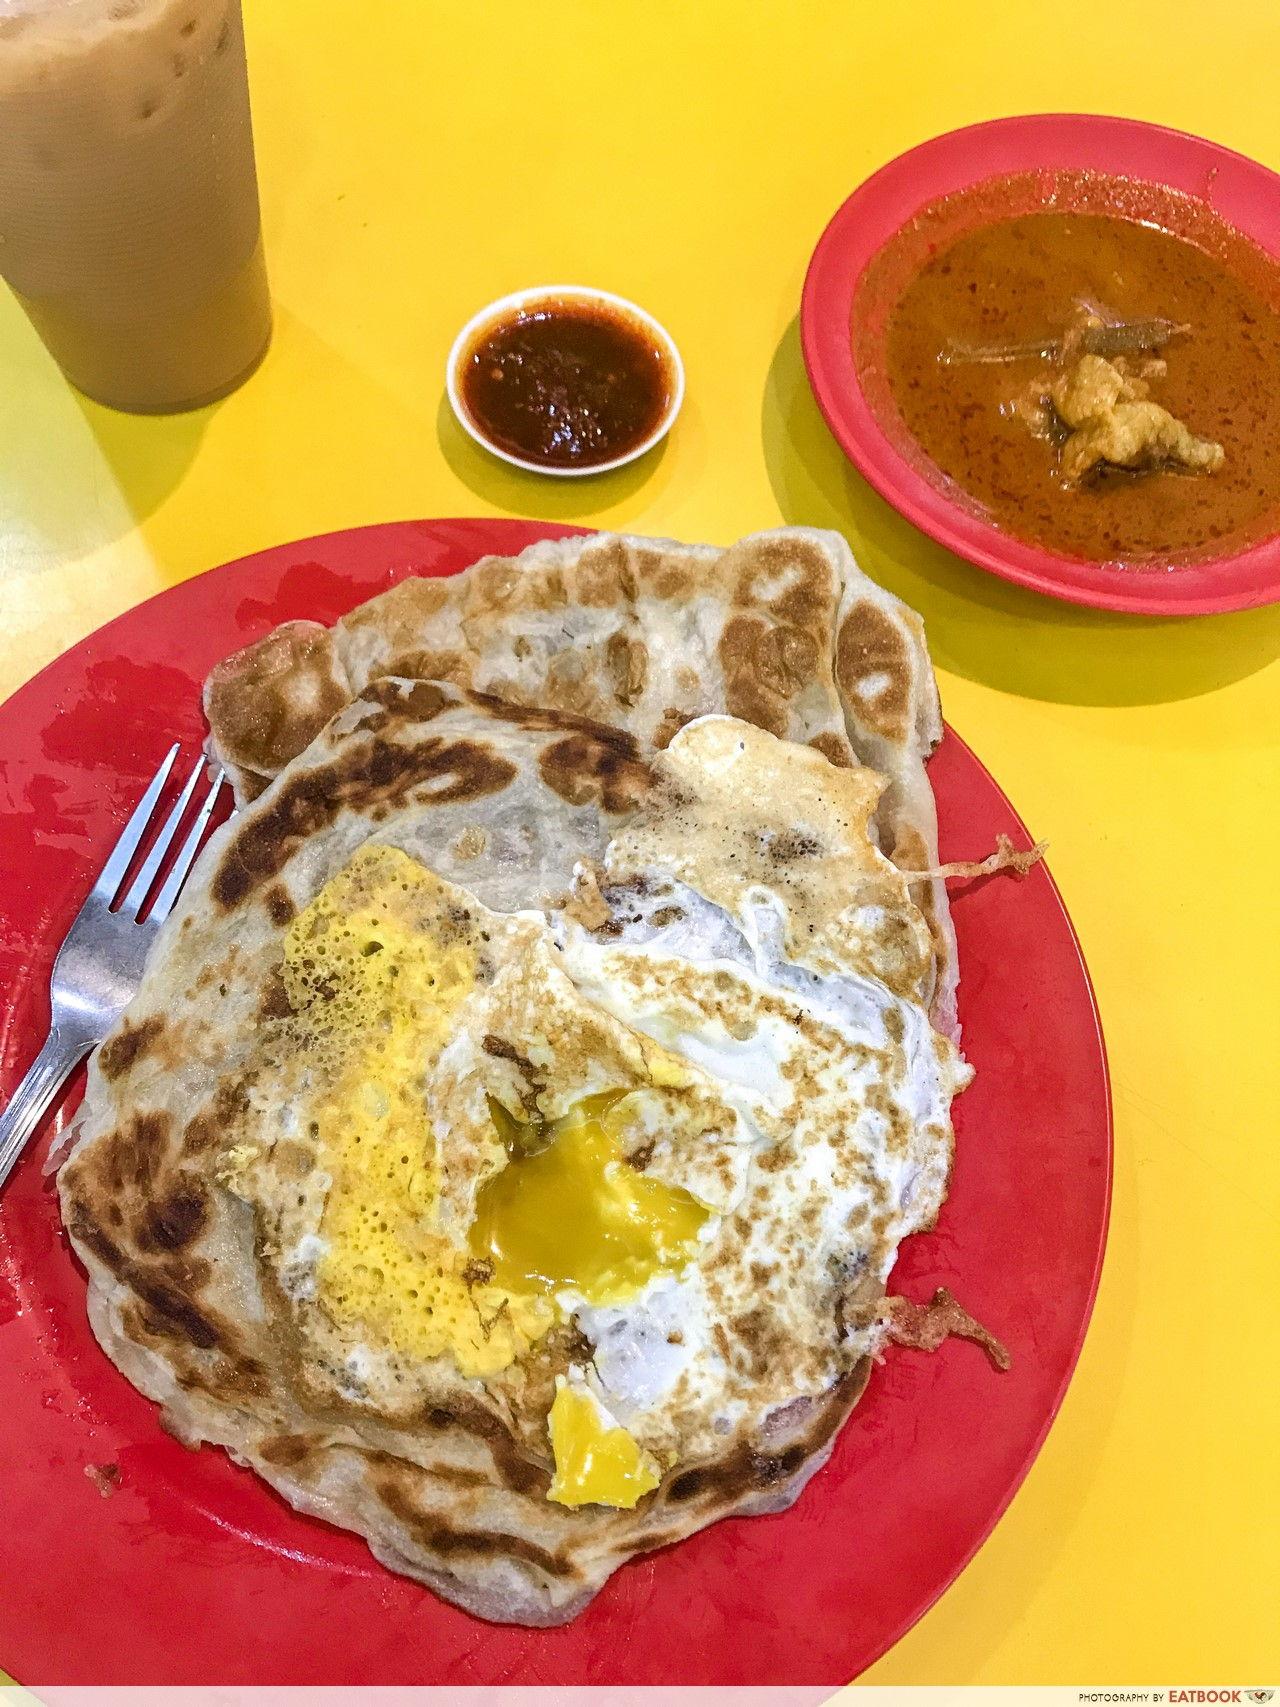 Tmpines East food - Saffron's Cafeteria Indian Food